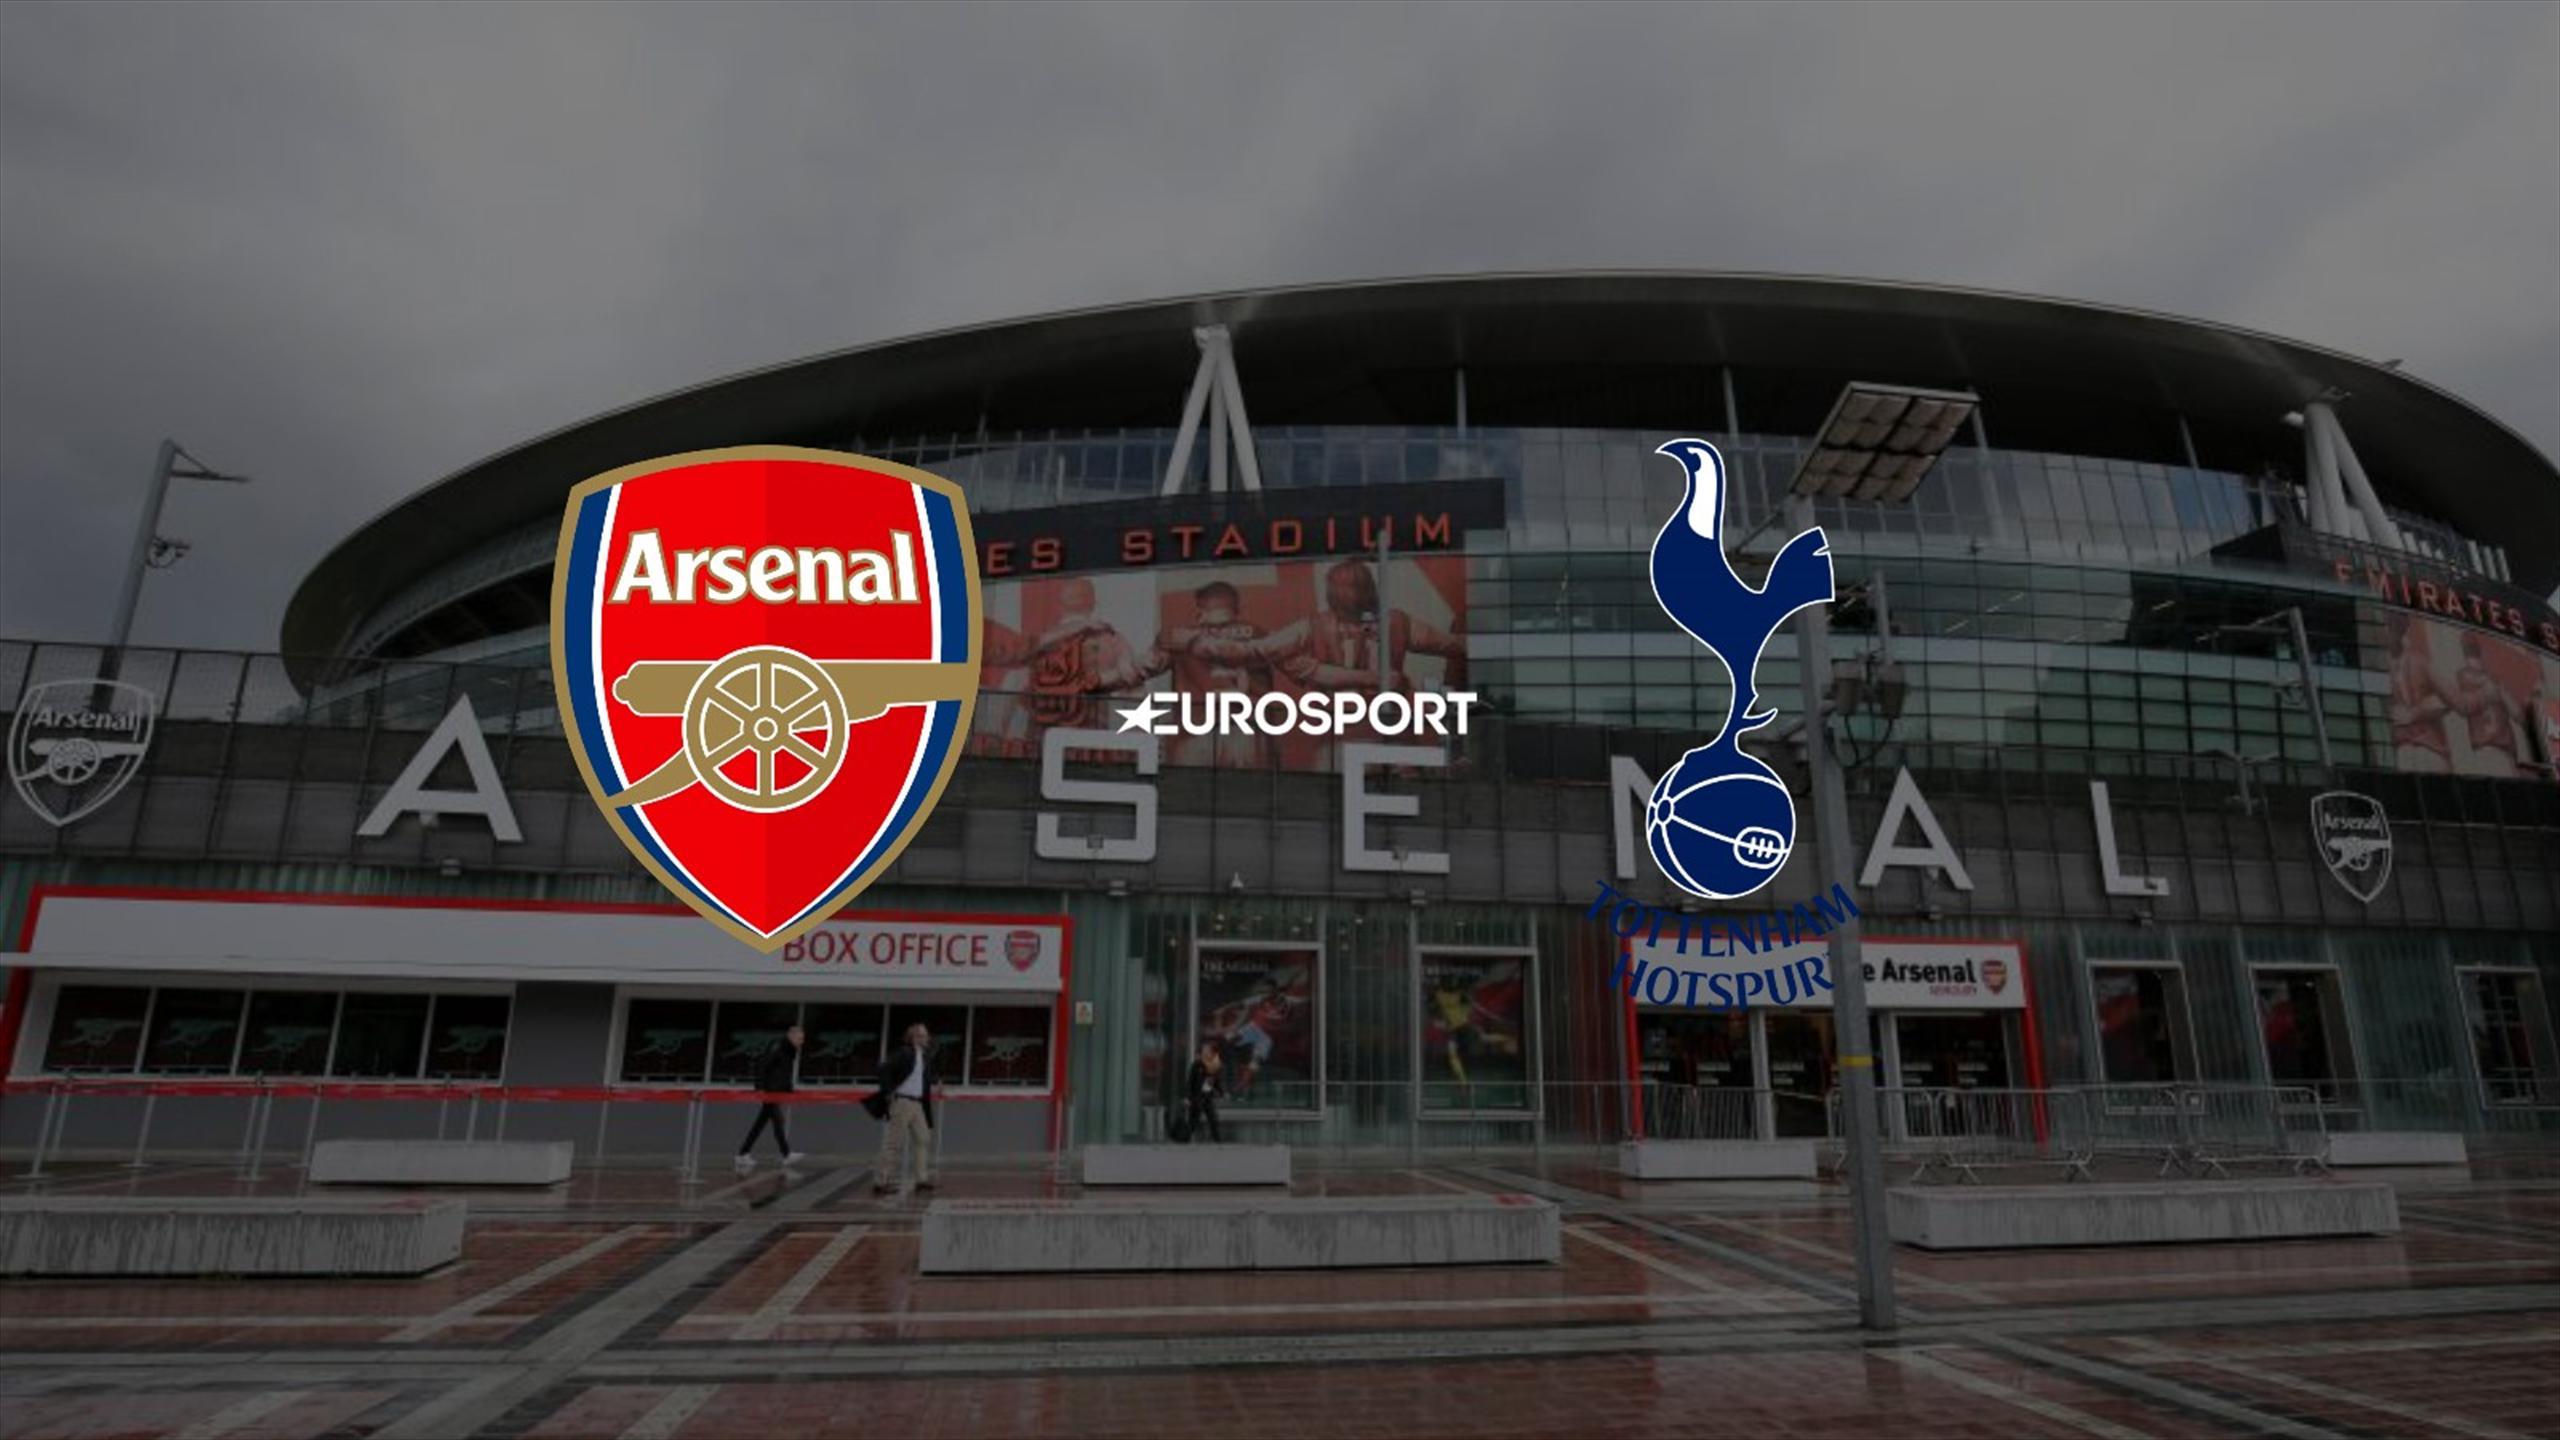 Арсенал лондон суонси сити канал в россии